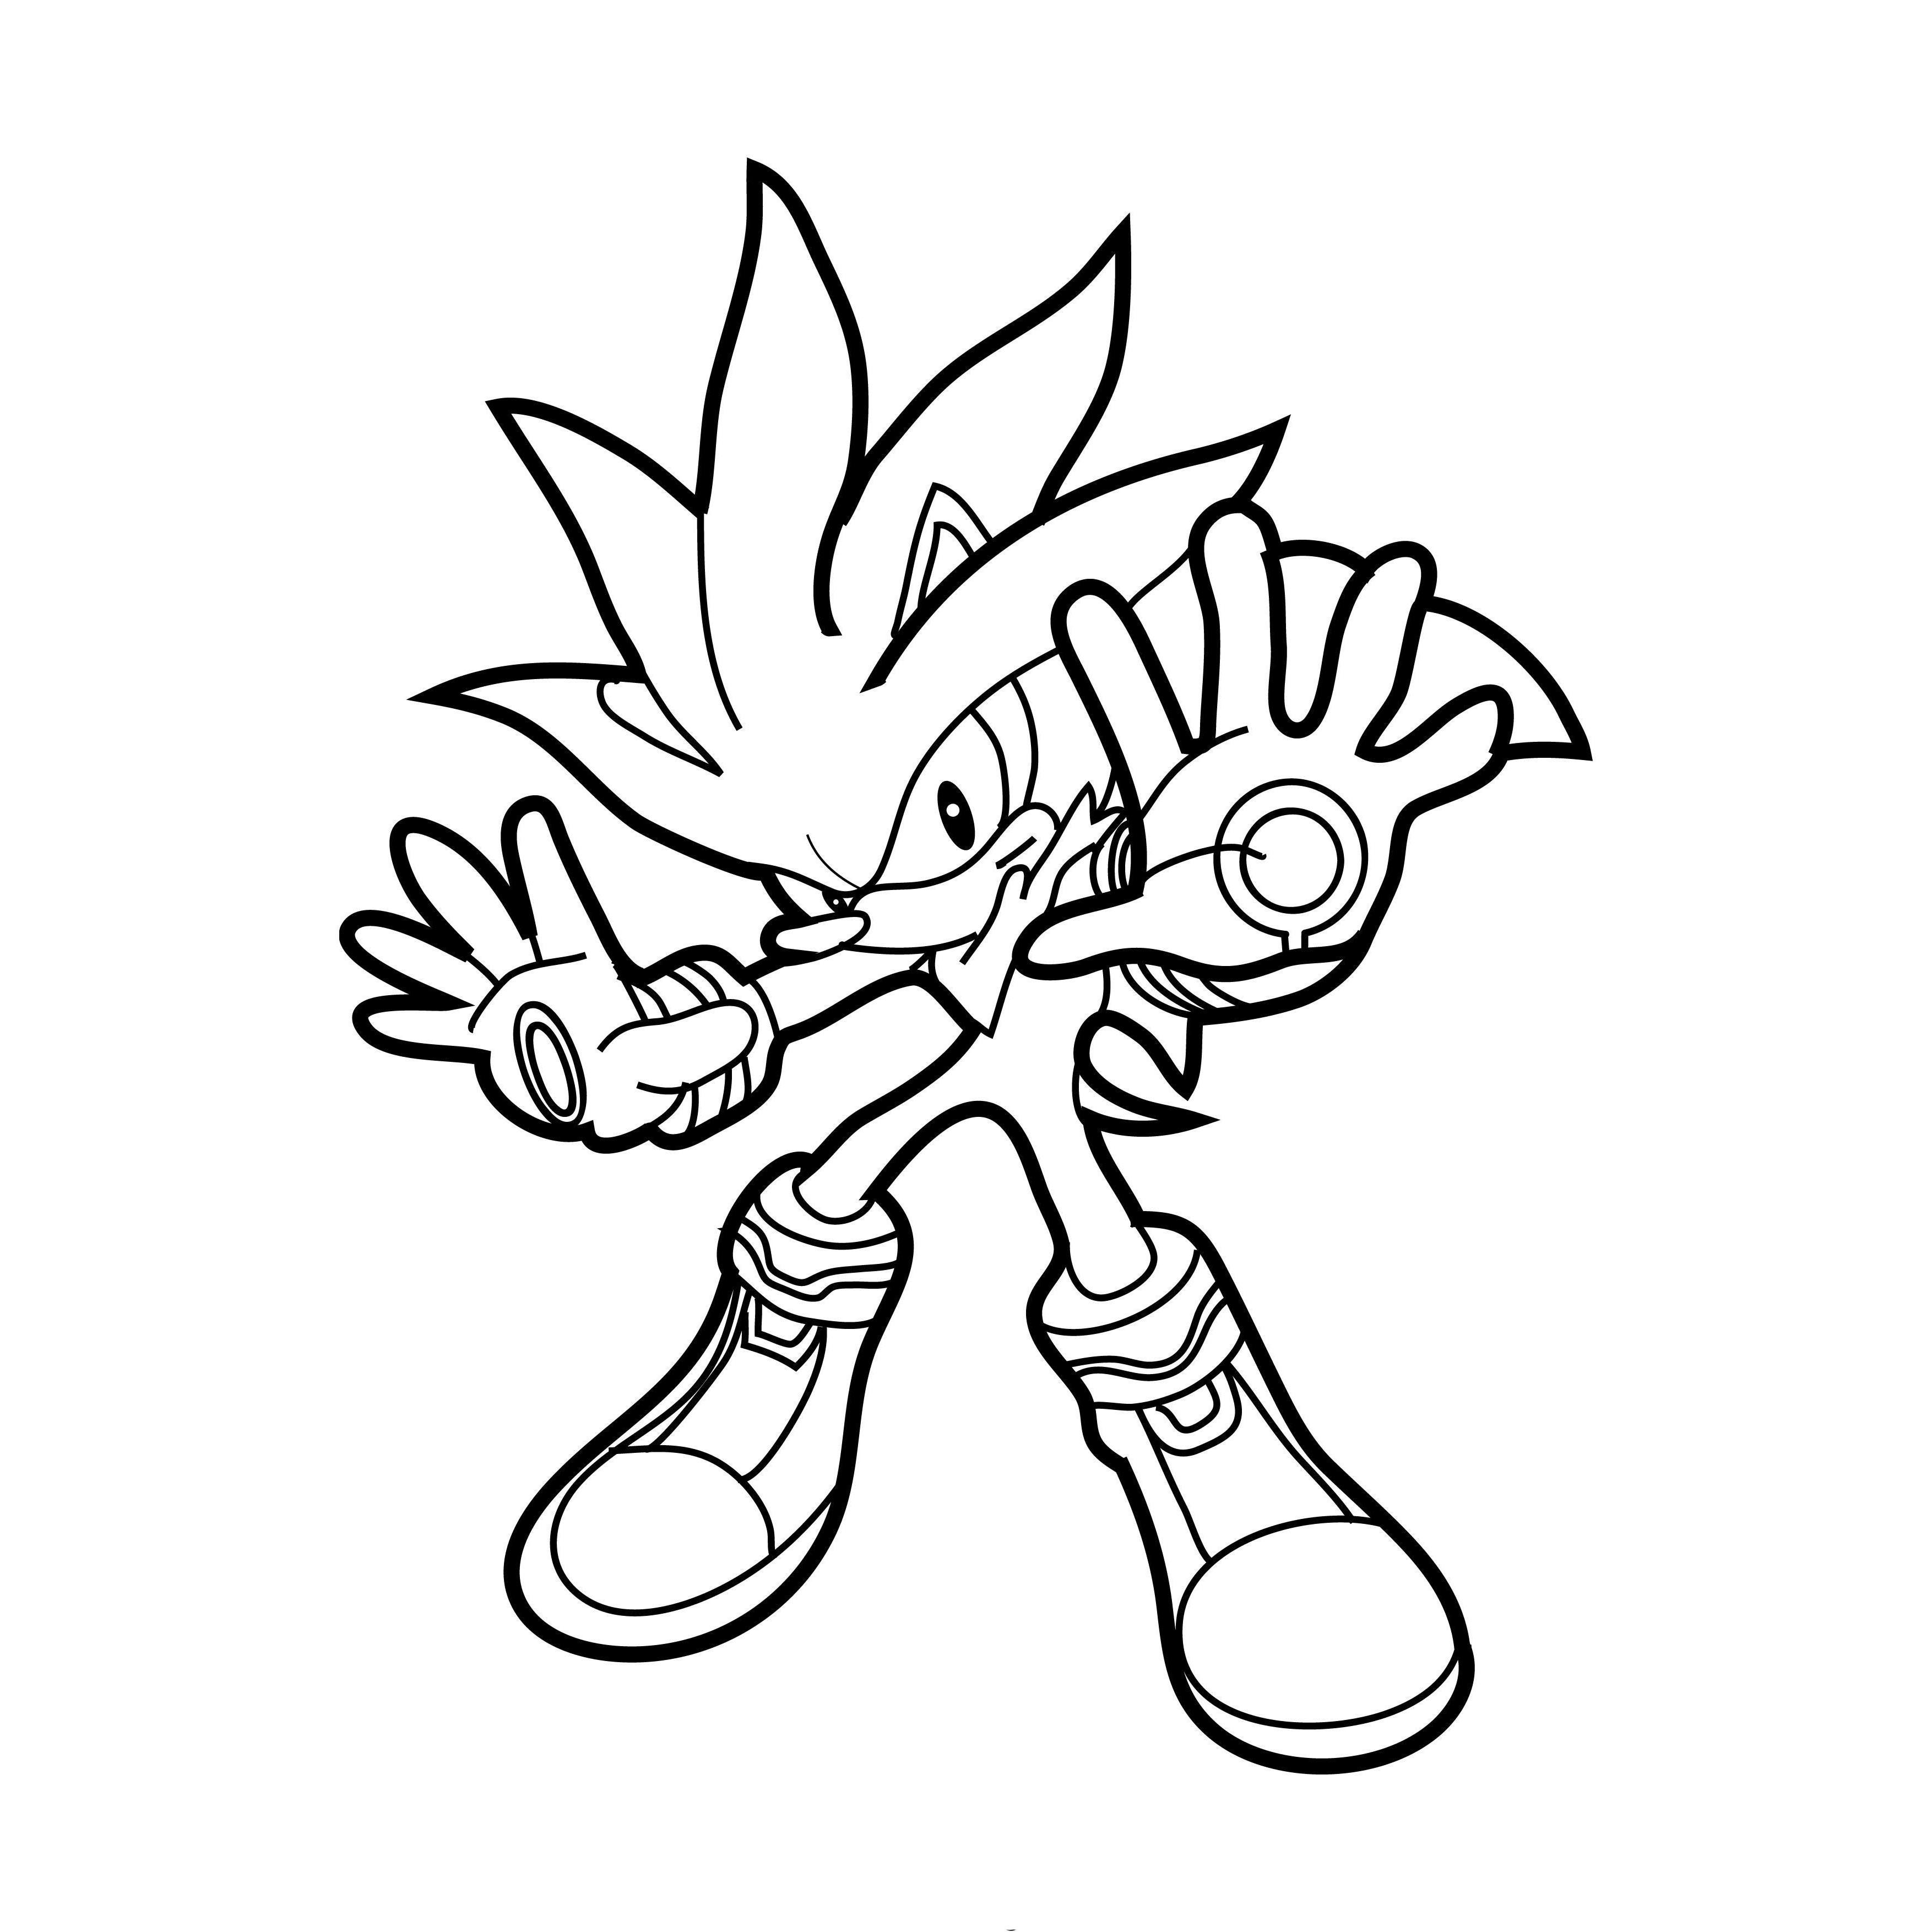 desenhos de sonic para colorir tudodesenhos